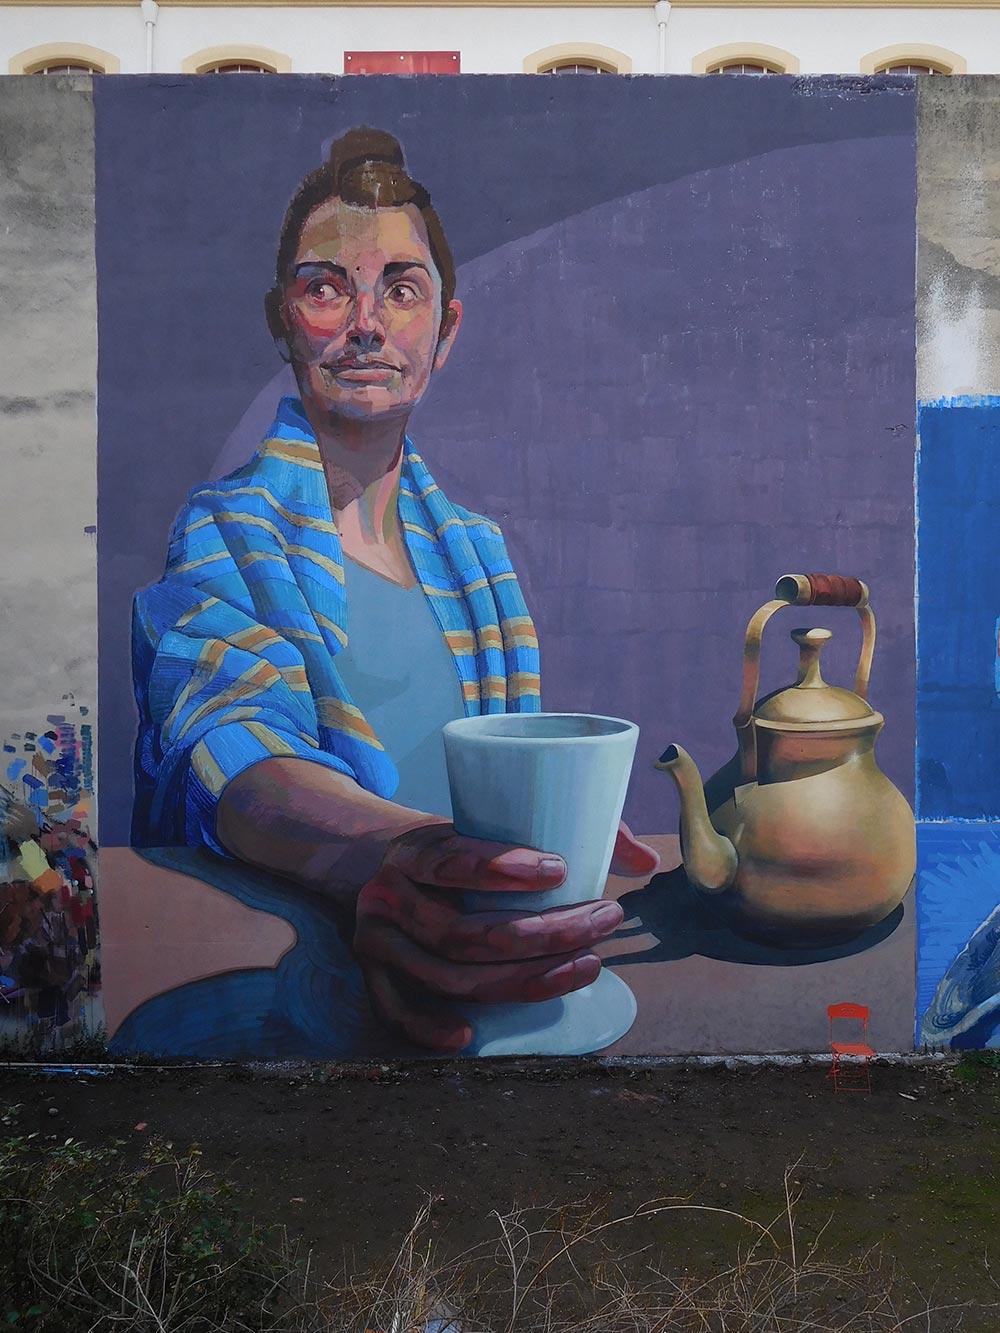 nefrit artist graffiti fresque peinture peintre ocm vibration